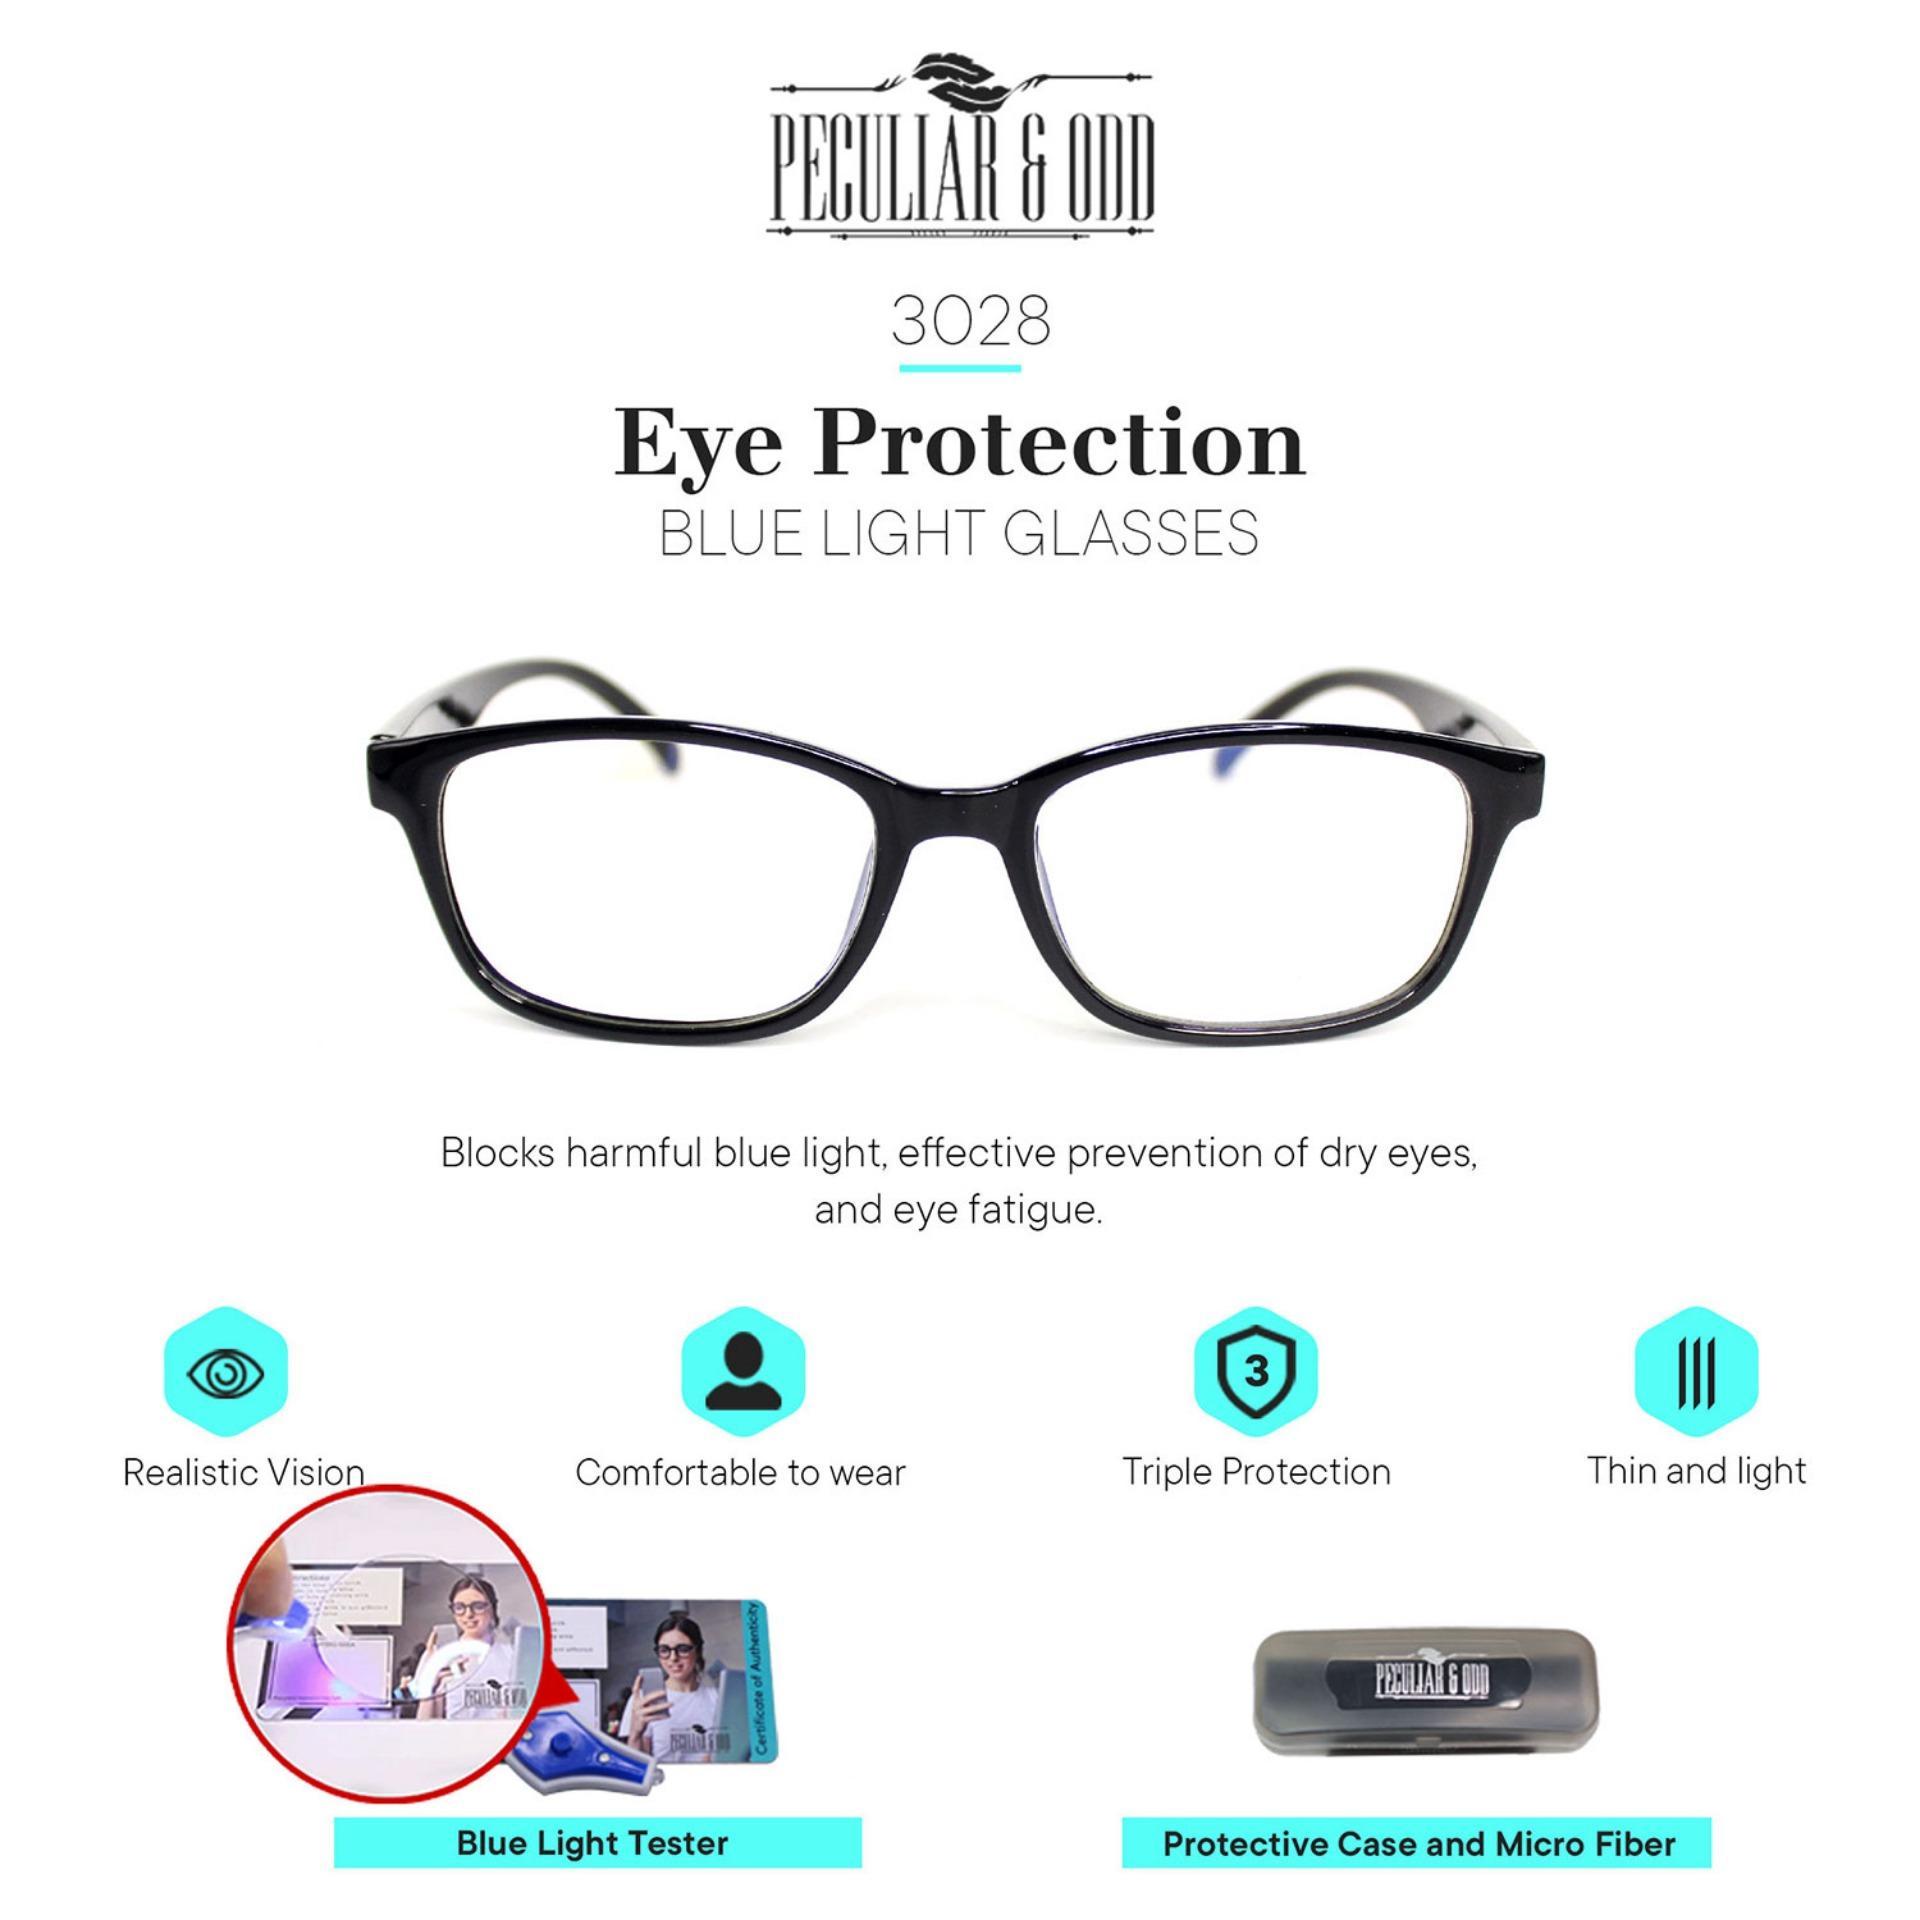 371fec2668b1 Peculiar Square 3028_CoalBlackClear Anti Radiation Computer Optical  Replaceable for Prescription _new Eyewear / Eyeglass- Peculiar